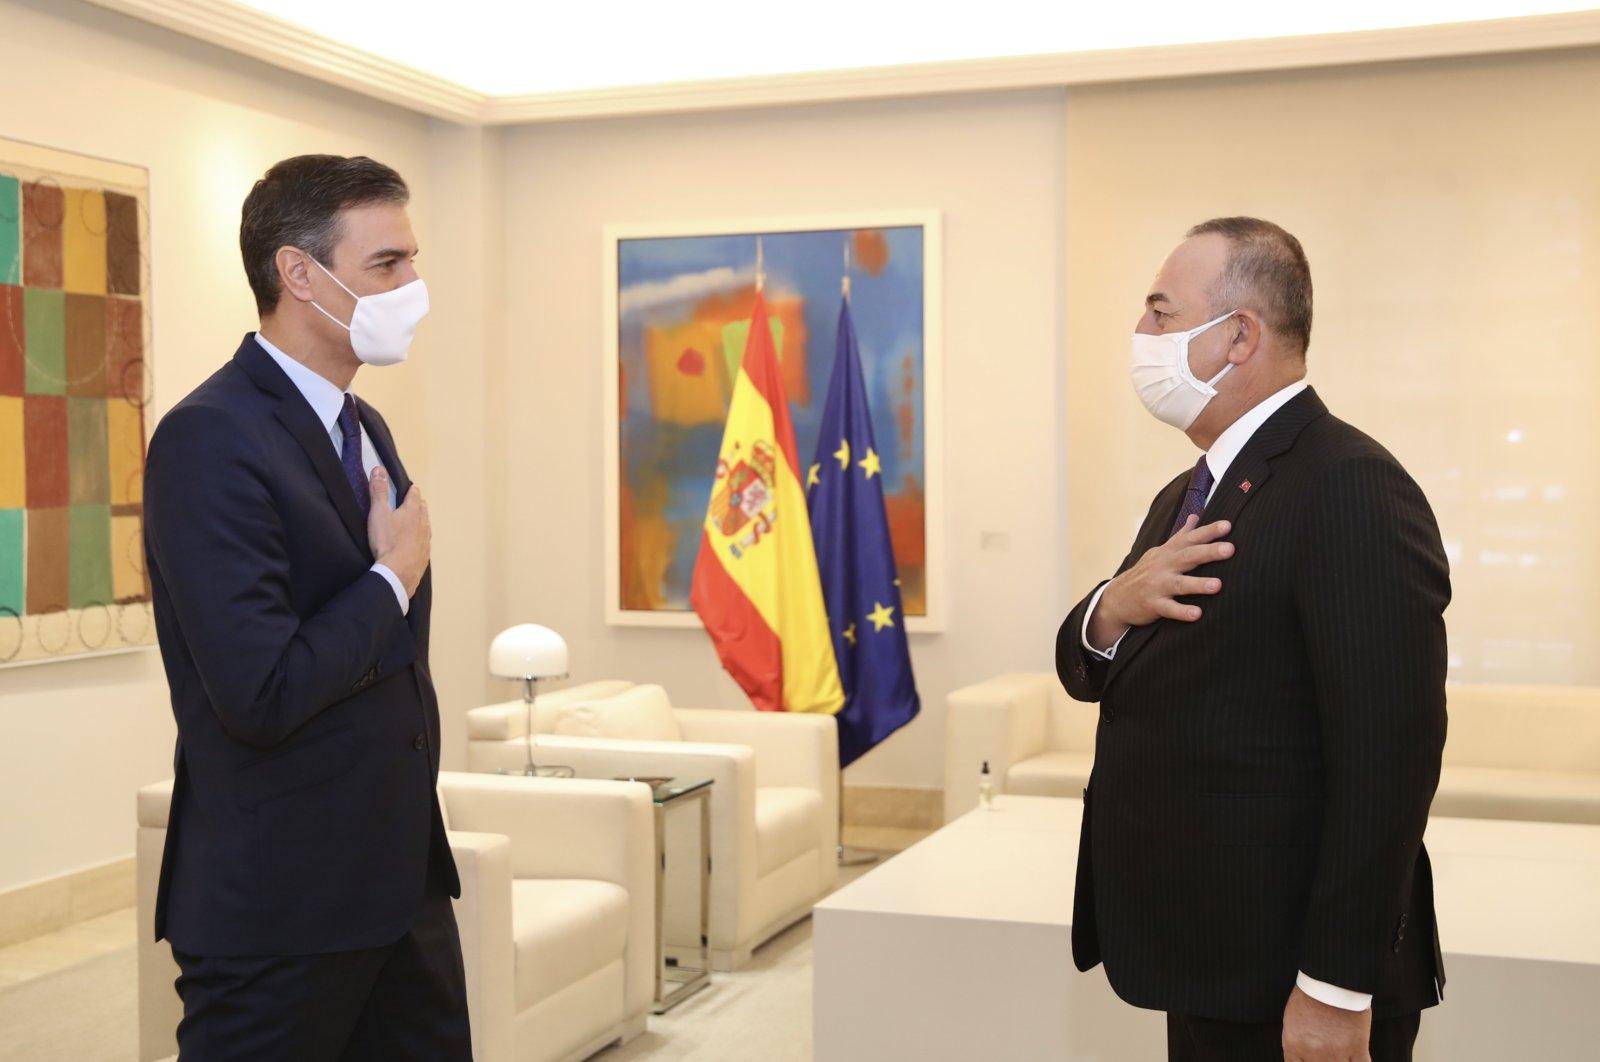 Foreign Minister Mevlüt Çavuşoğlu (R) meets with Spain's Prime Minister Pedro Sanchez in Madrid, Spain, Jan. 8, 2020. (AA Photo)